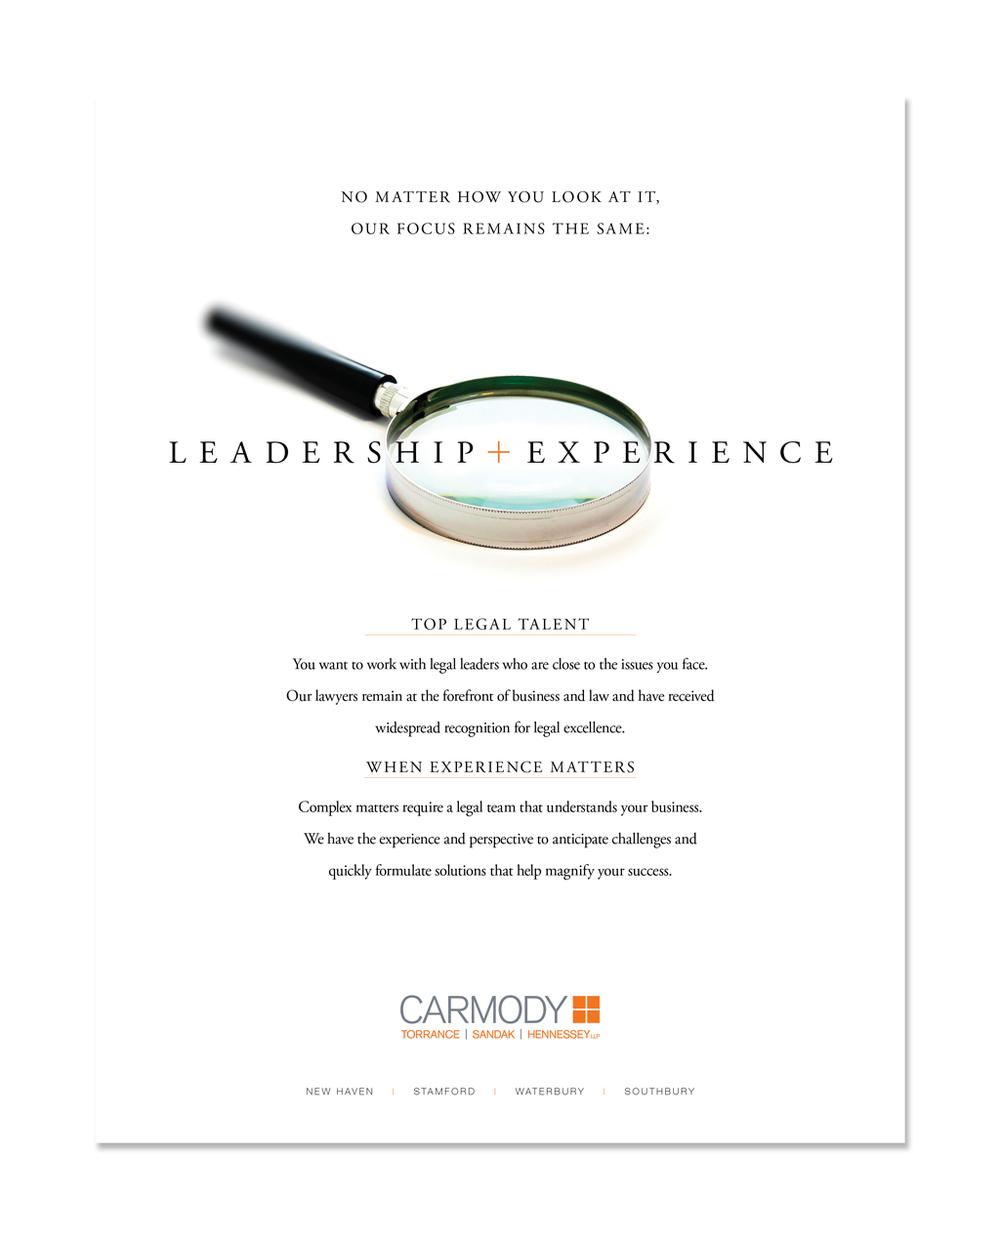 LEADERSHIP + EXPERIENCE Print Ad: Carmody Torrance Sandak & Hennessey LLP